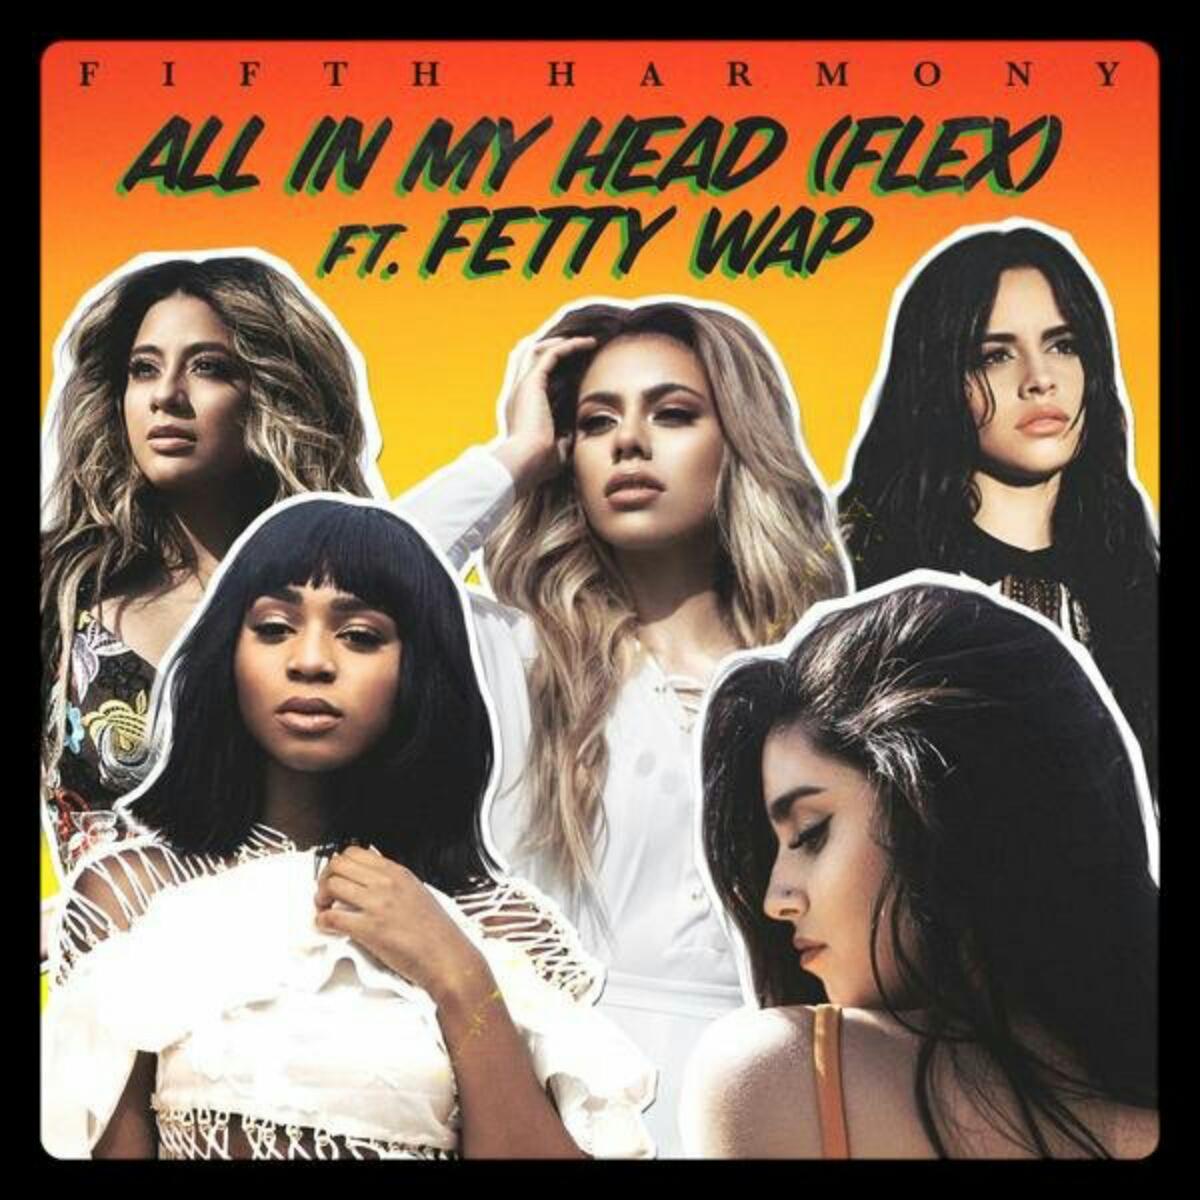 All In My Head (Flex) | Fifth Harmony Wiki | FANDOM ...